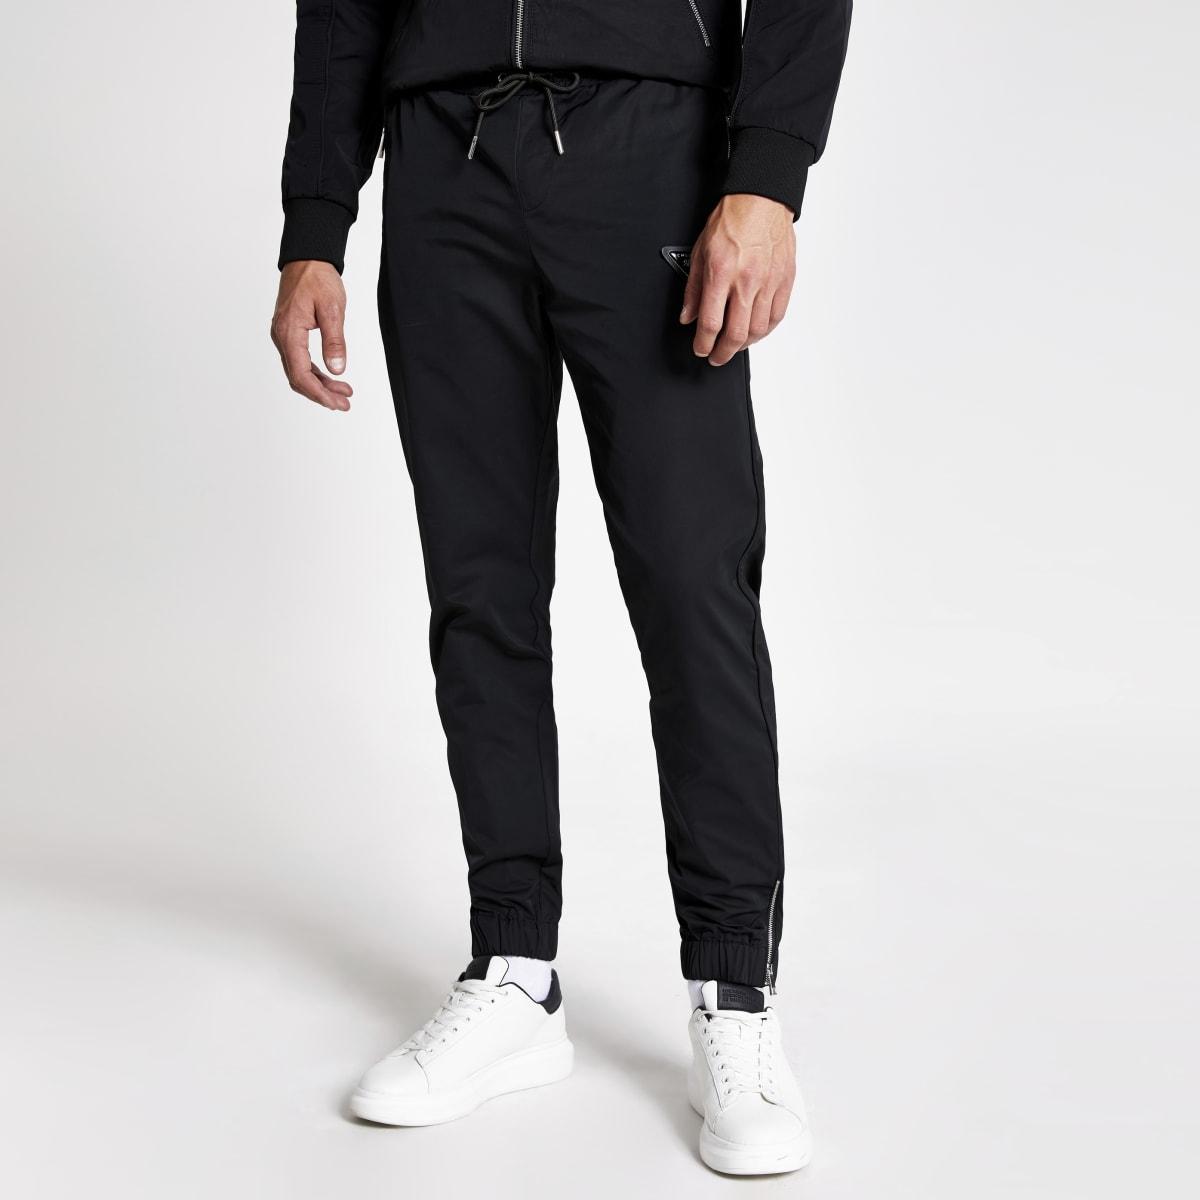 MCMLX - Zwarte nylon joggingbroek